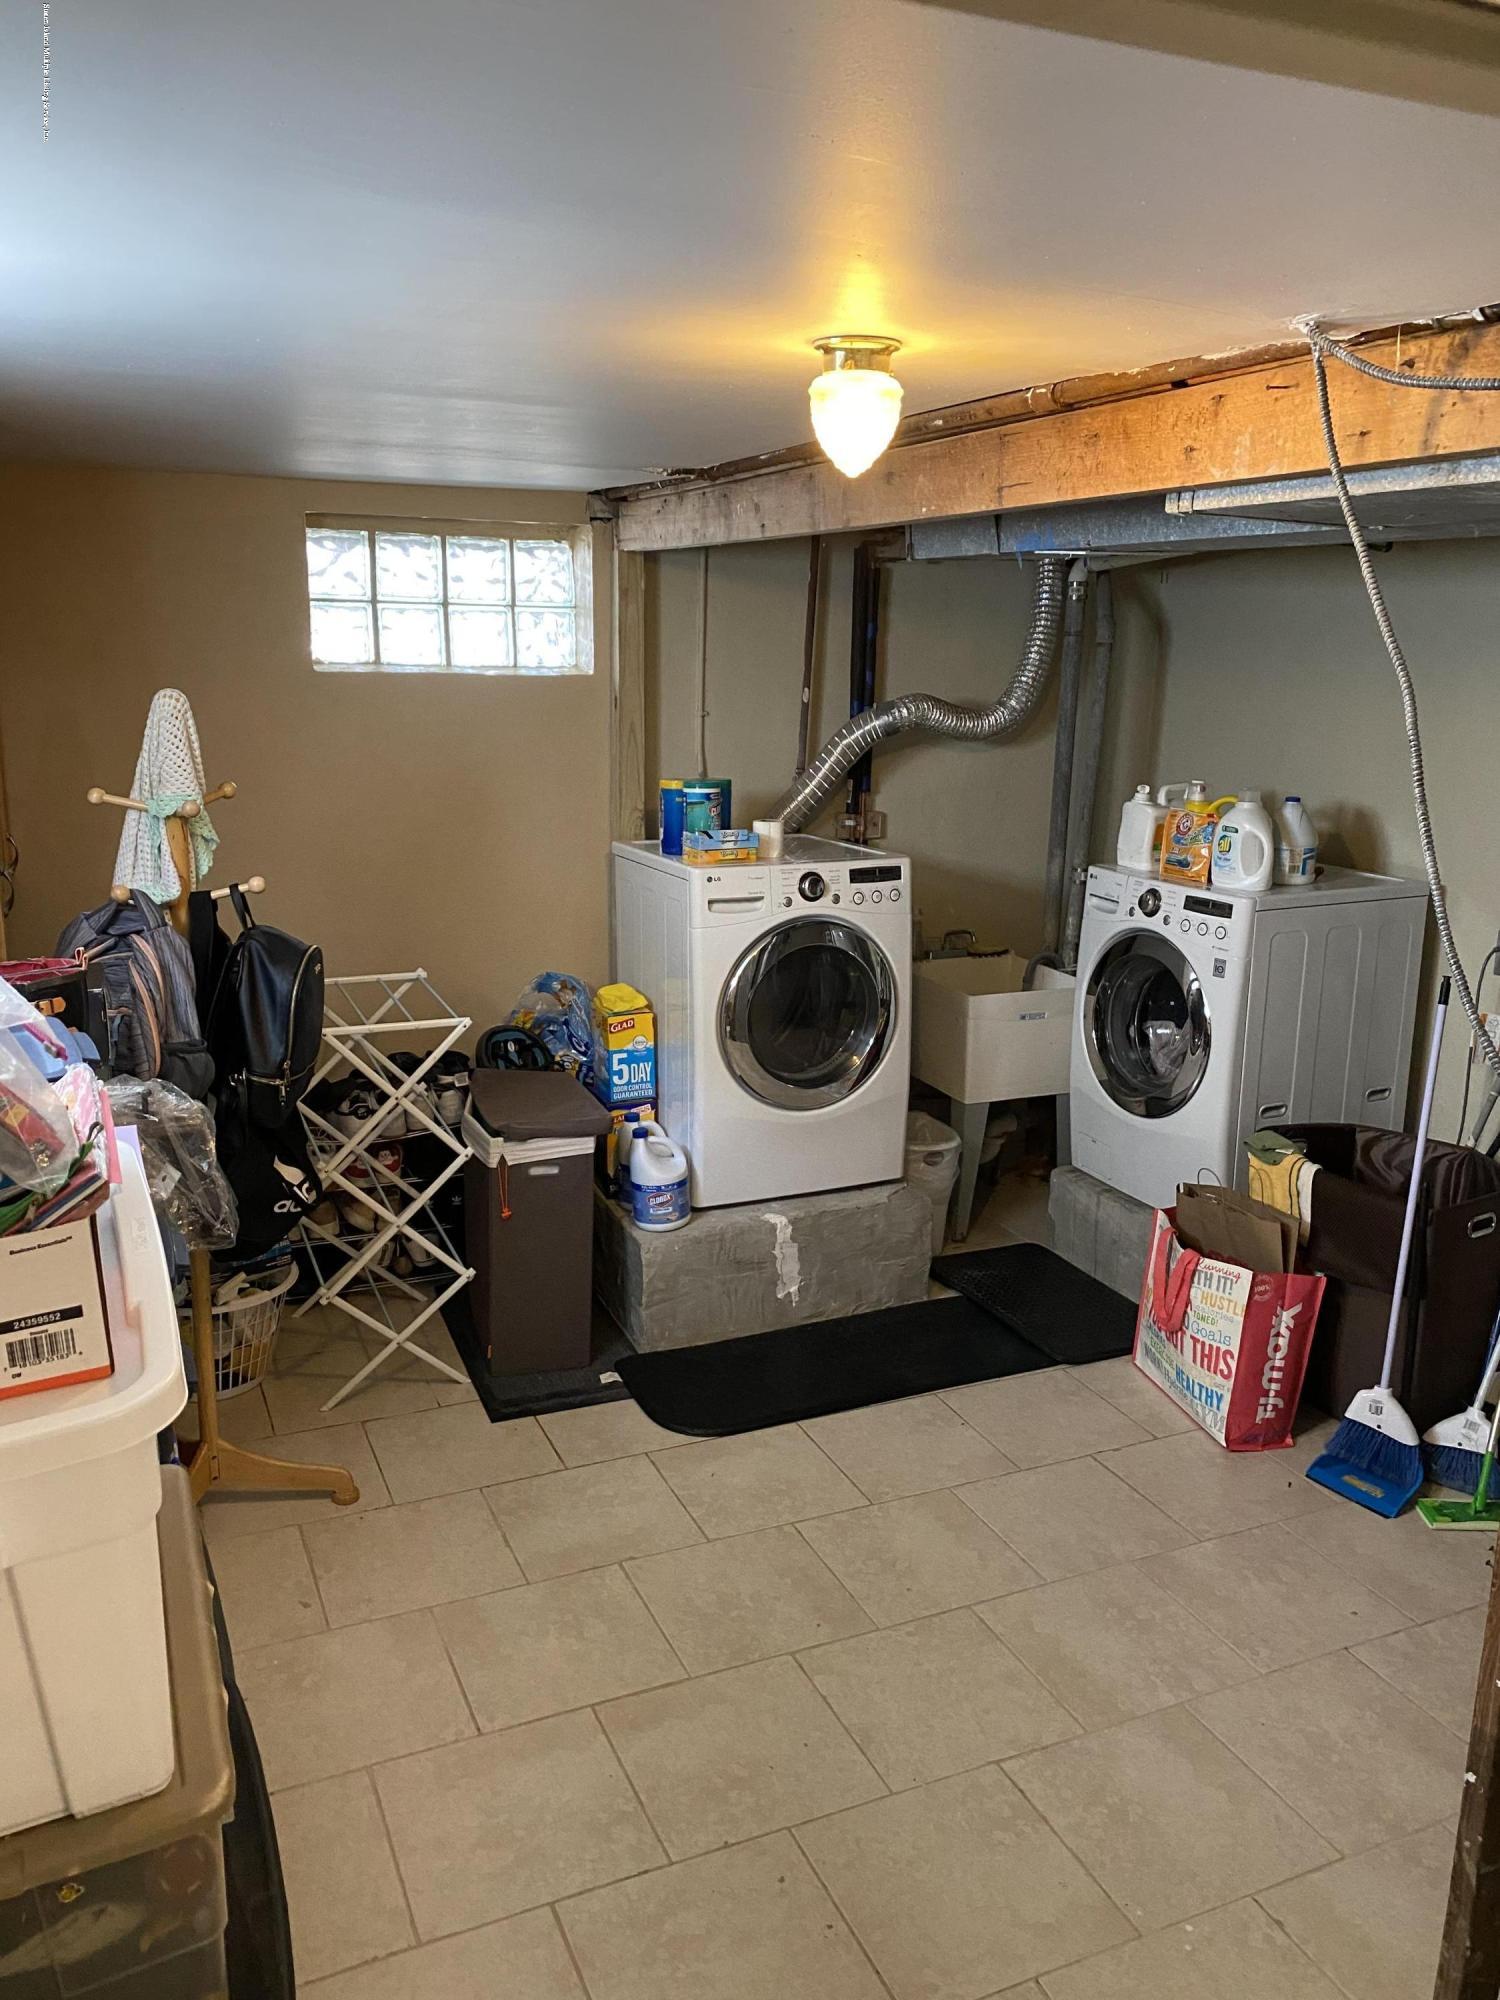 Single Family - Semi-Attached 370 Seaver Avenue  Staten Island, NY 10305, MLS-1136339-30